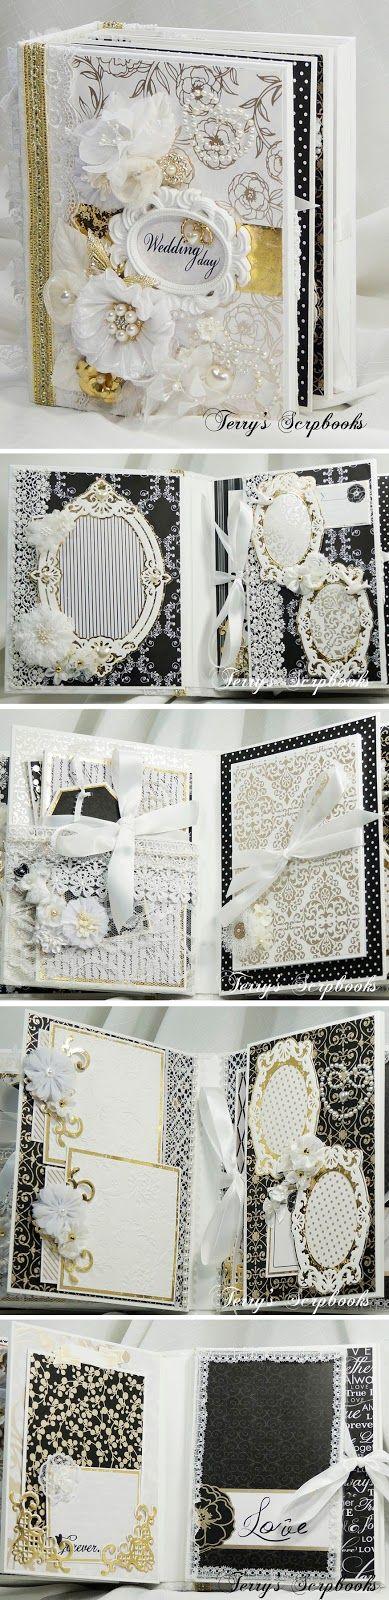 Terry's Scrapbooks: Die Cuts With A View ( DCWV ) Everlasting Love Wedding Mini scrapbook album